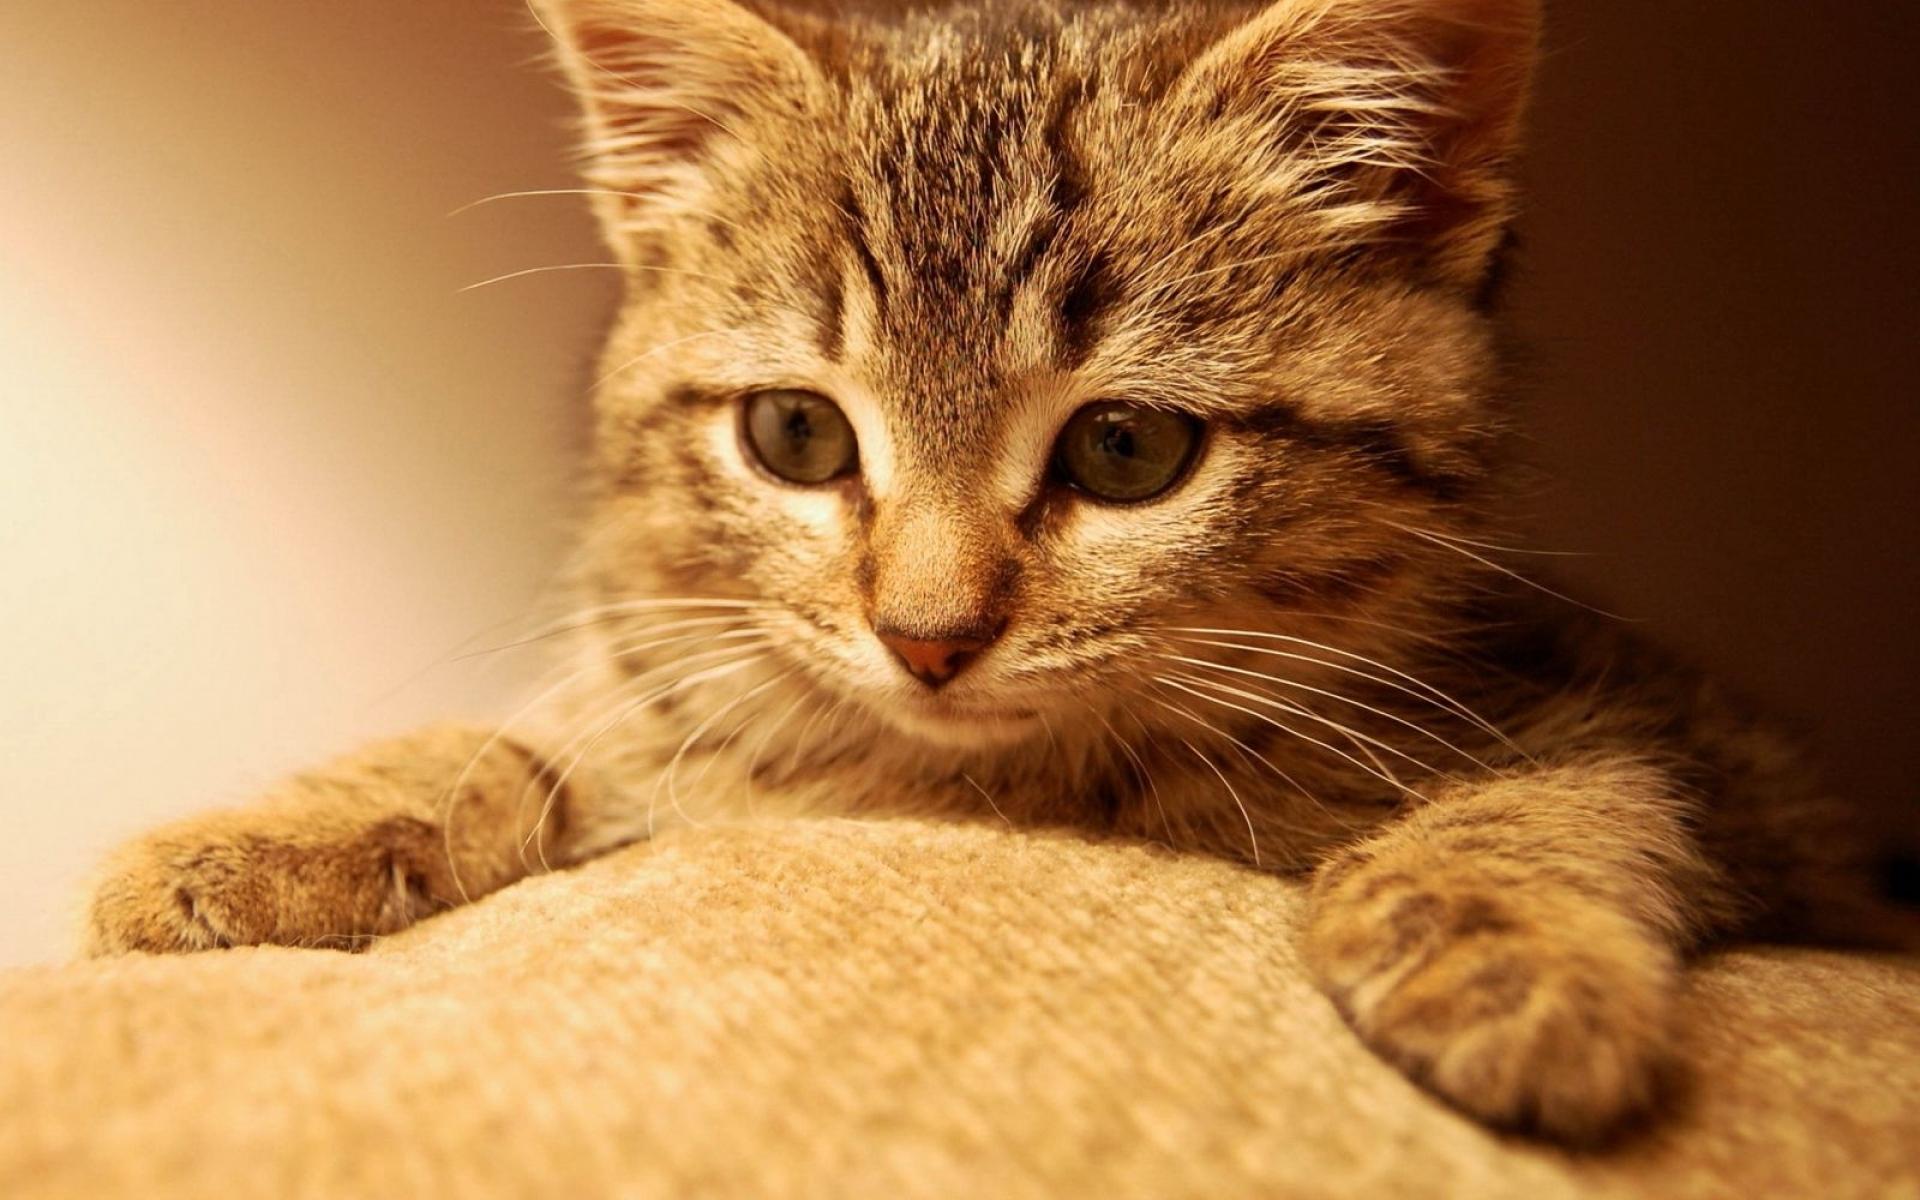 Картинки Кошка, кошки, котенок, имбирь фото и обои на рабочий стол